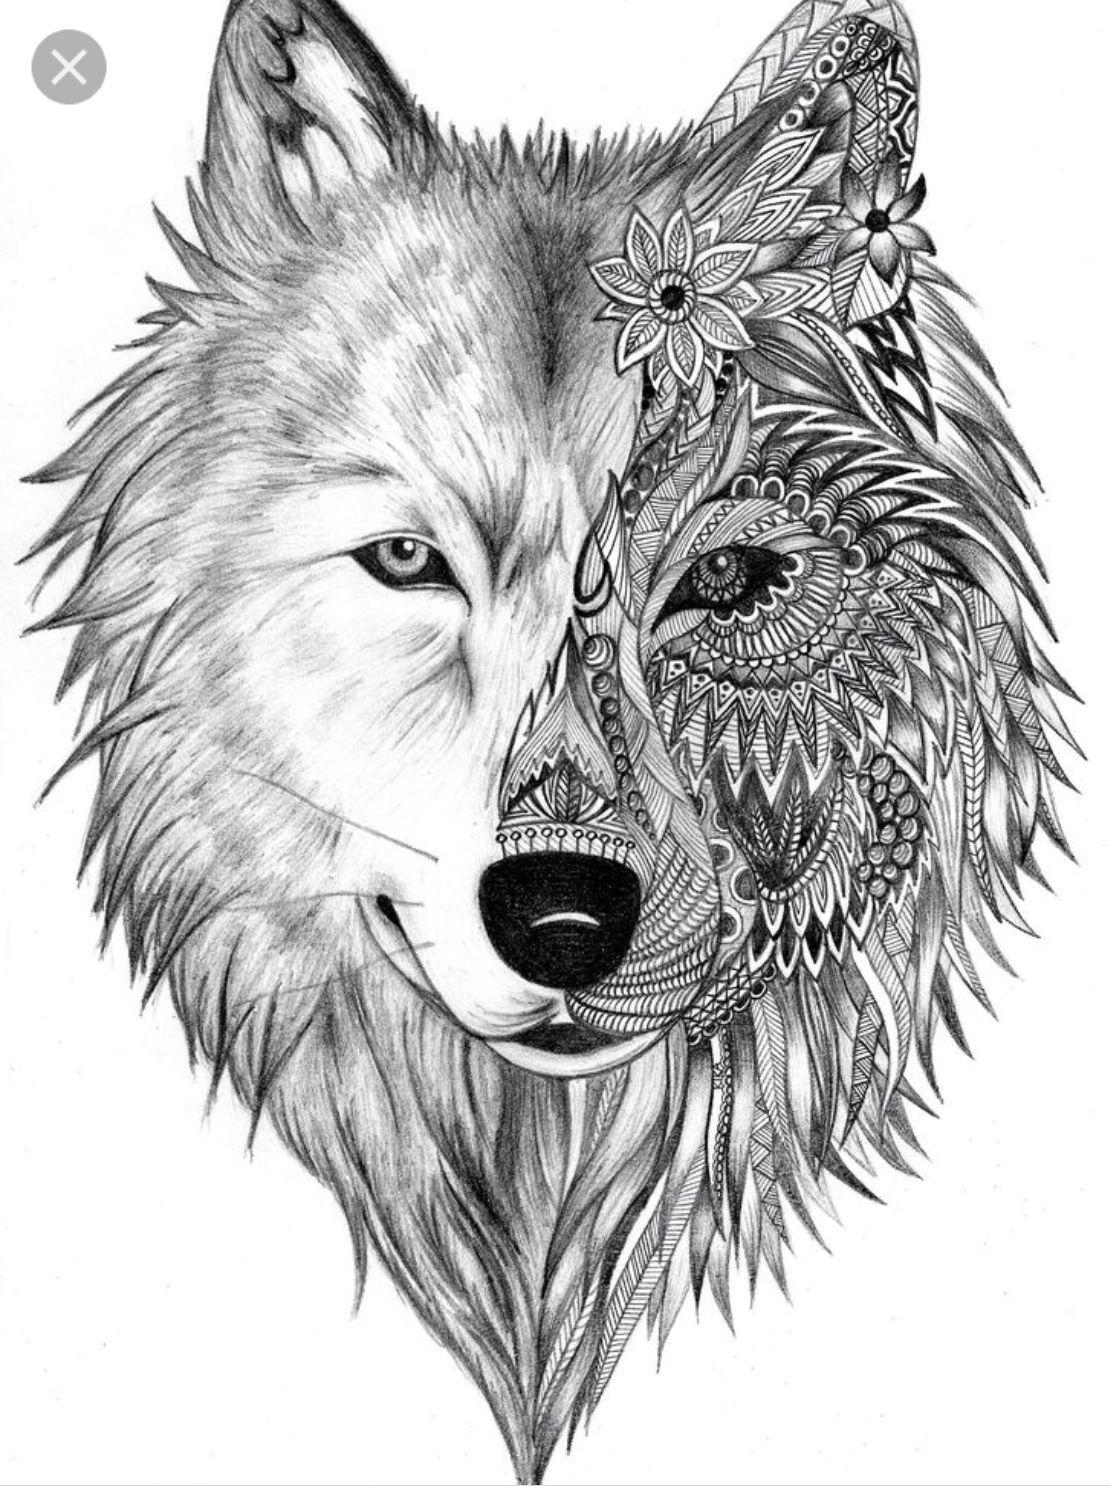 Pin By Adan Rodriguez On Lobos Tatuajes Tatuaje Geométrico